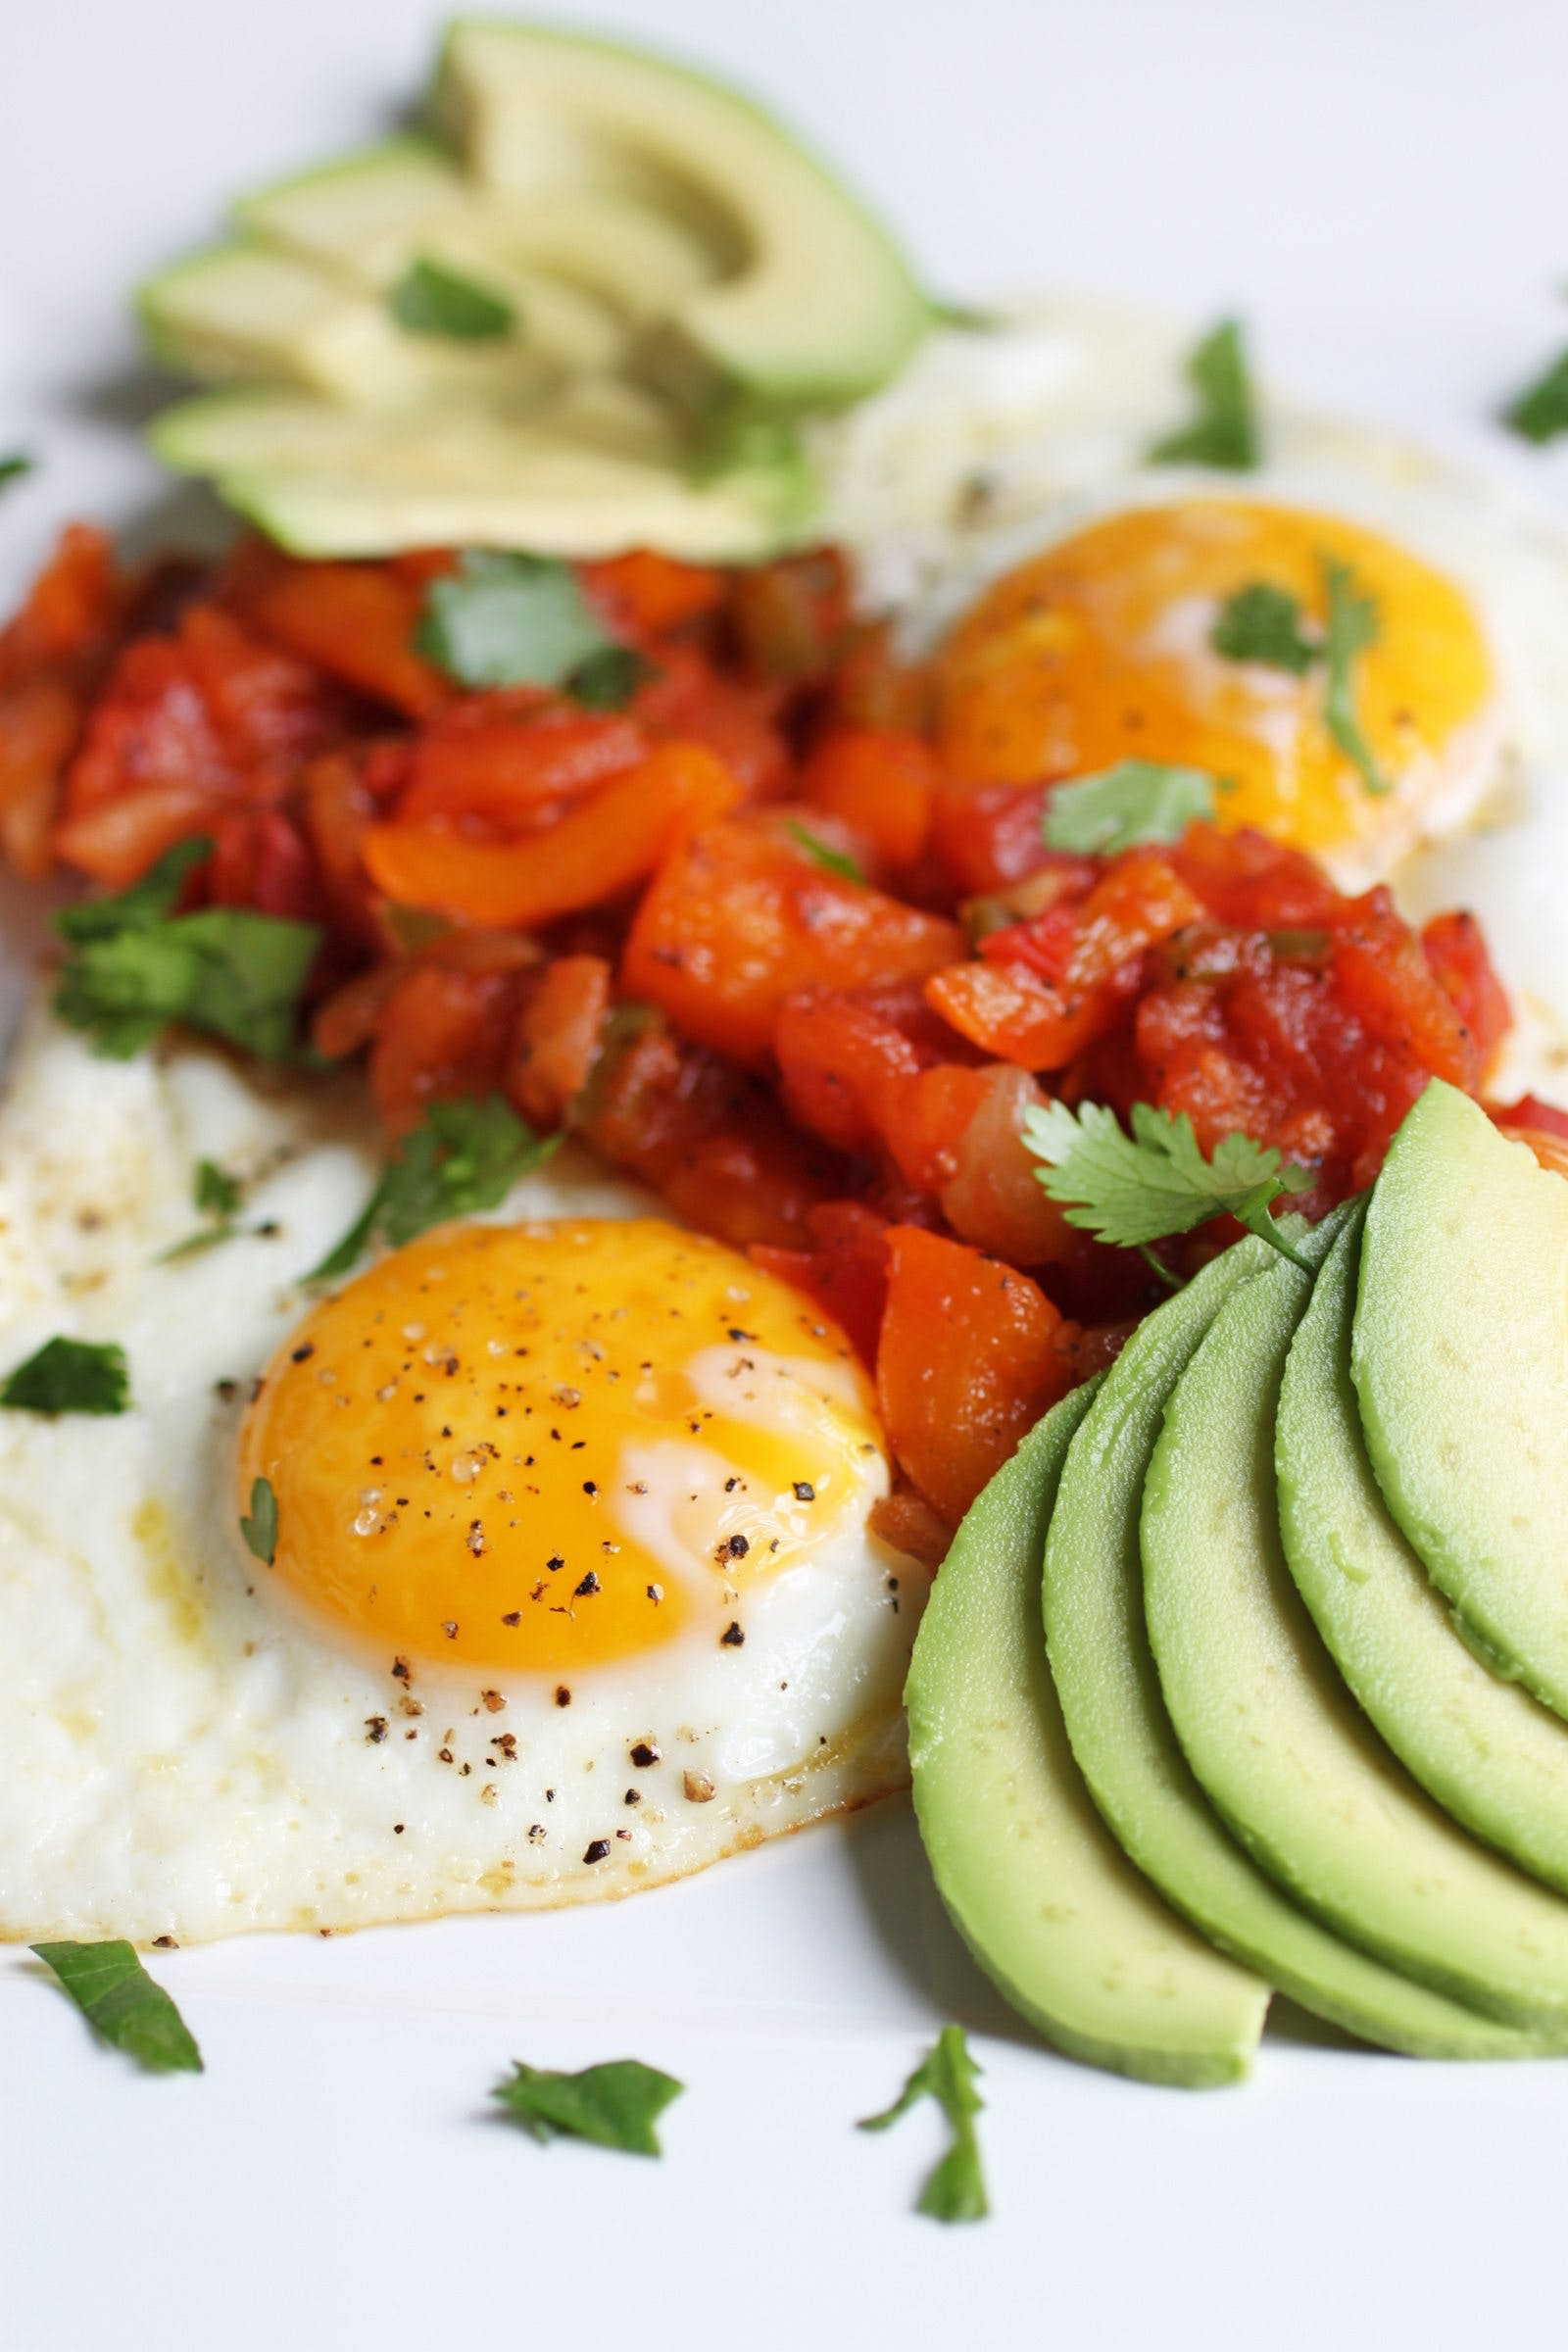 Low-carb huevos rancheros